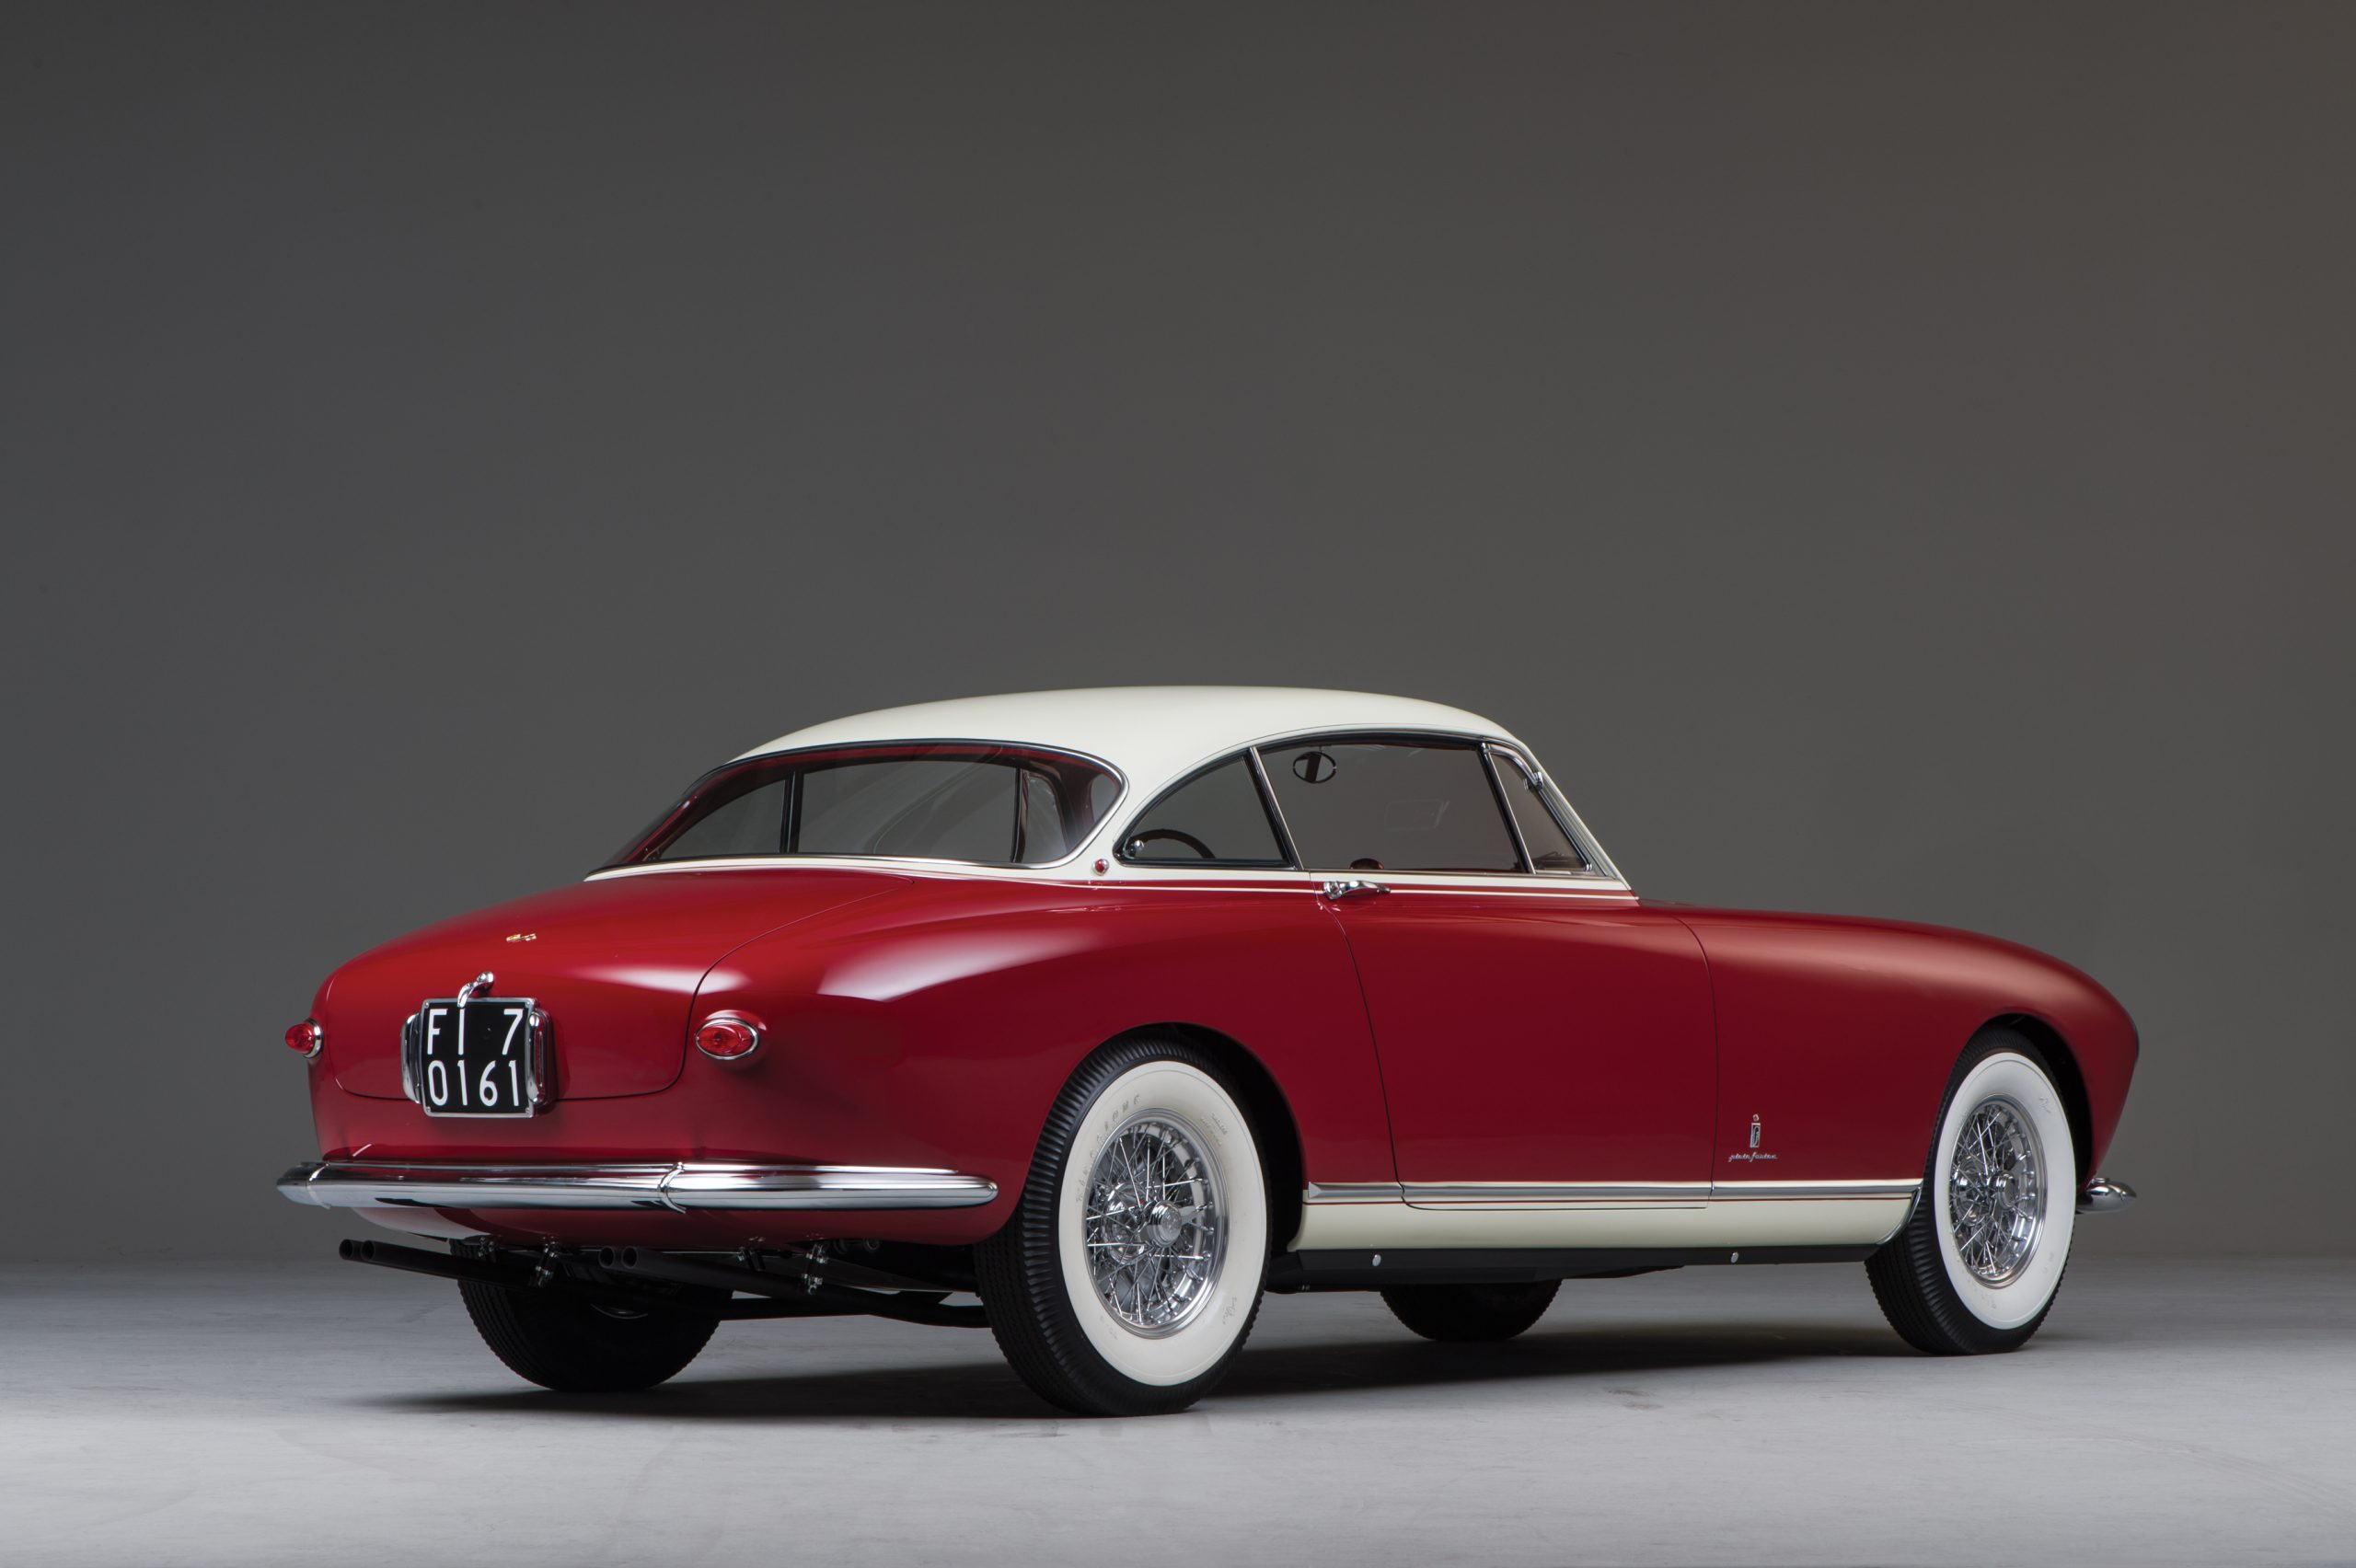 1953-Ferrari-250-Europa-Coupe-by-Pinin-Farina